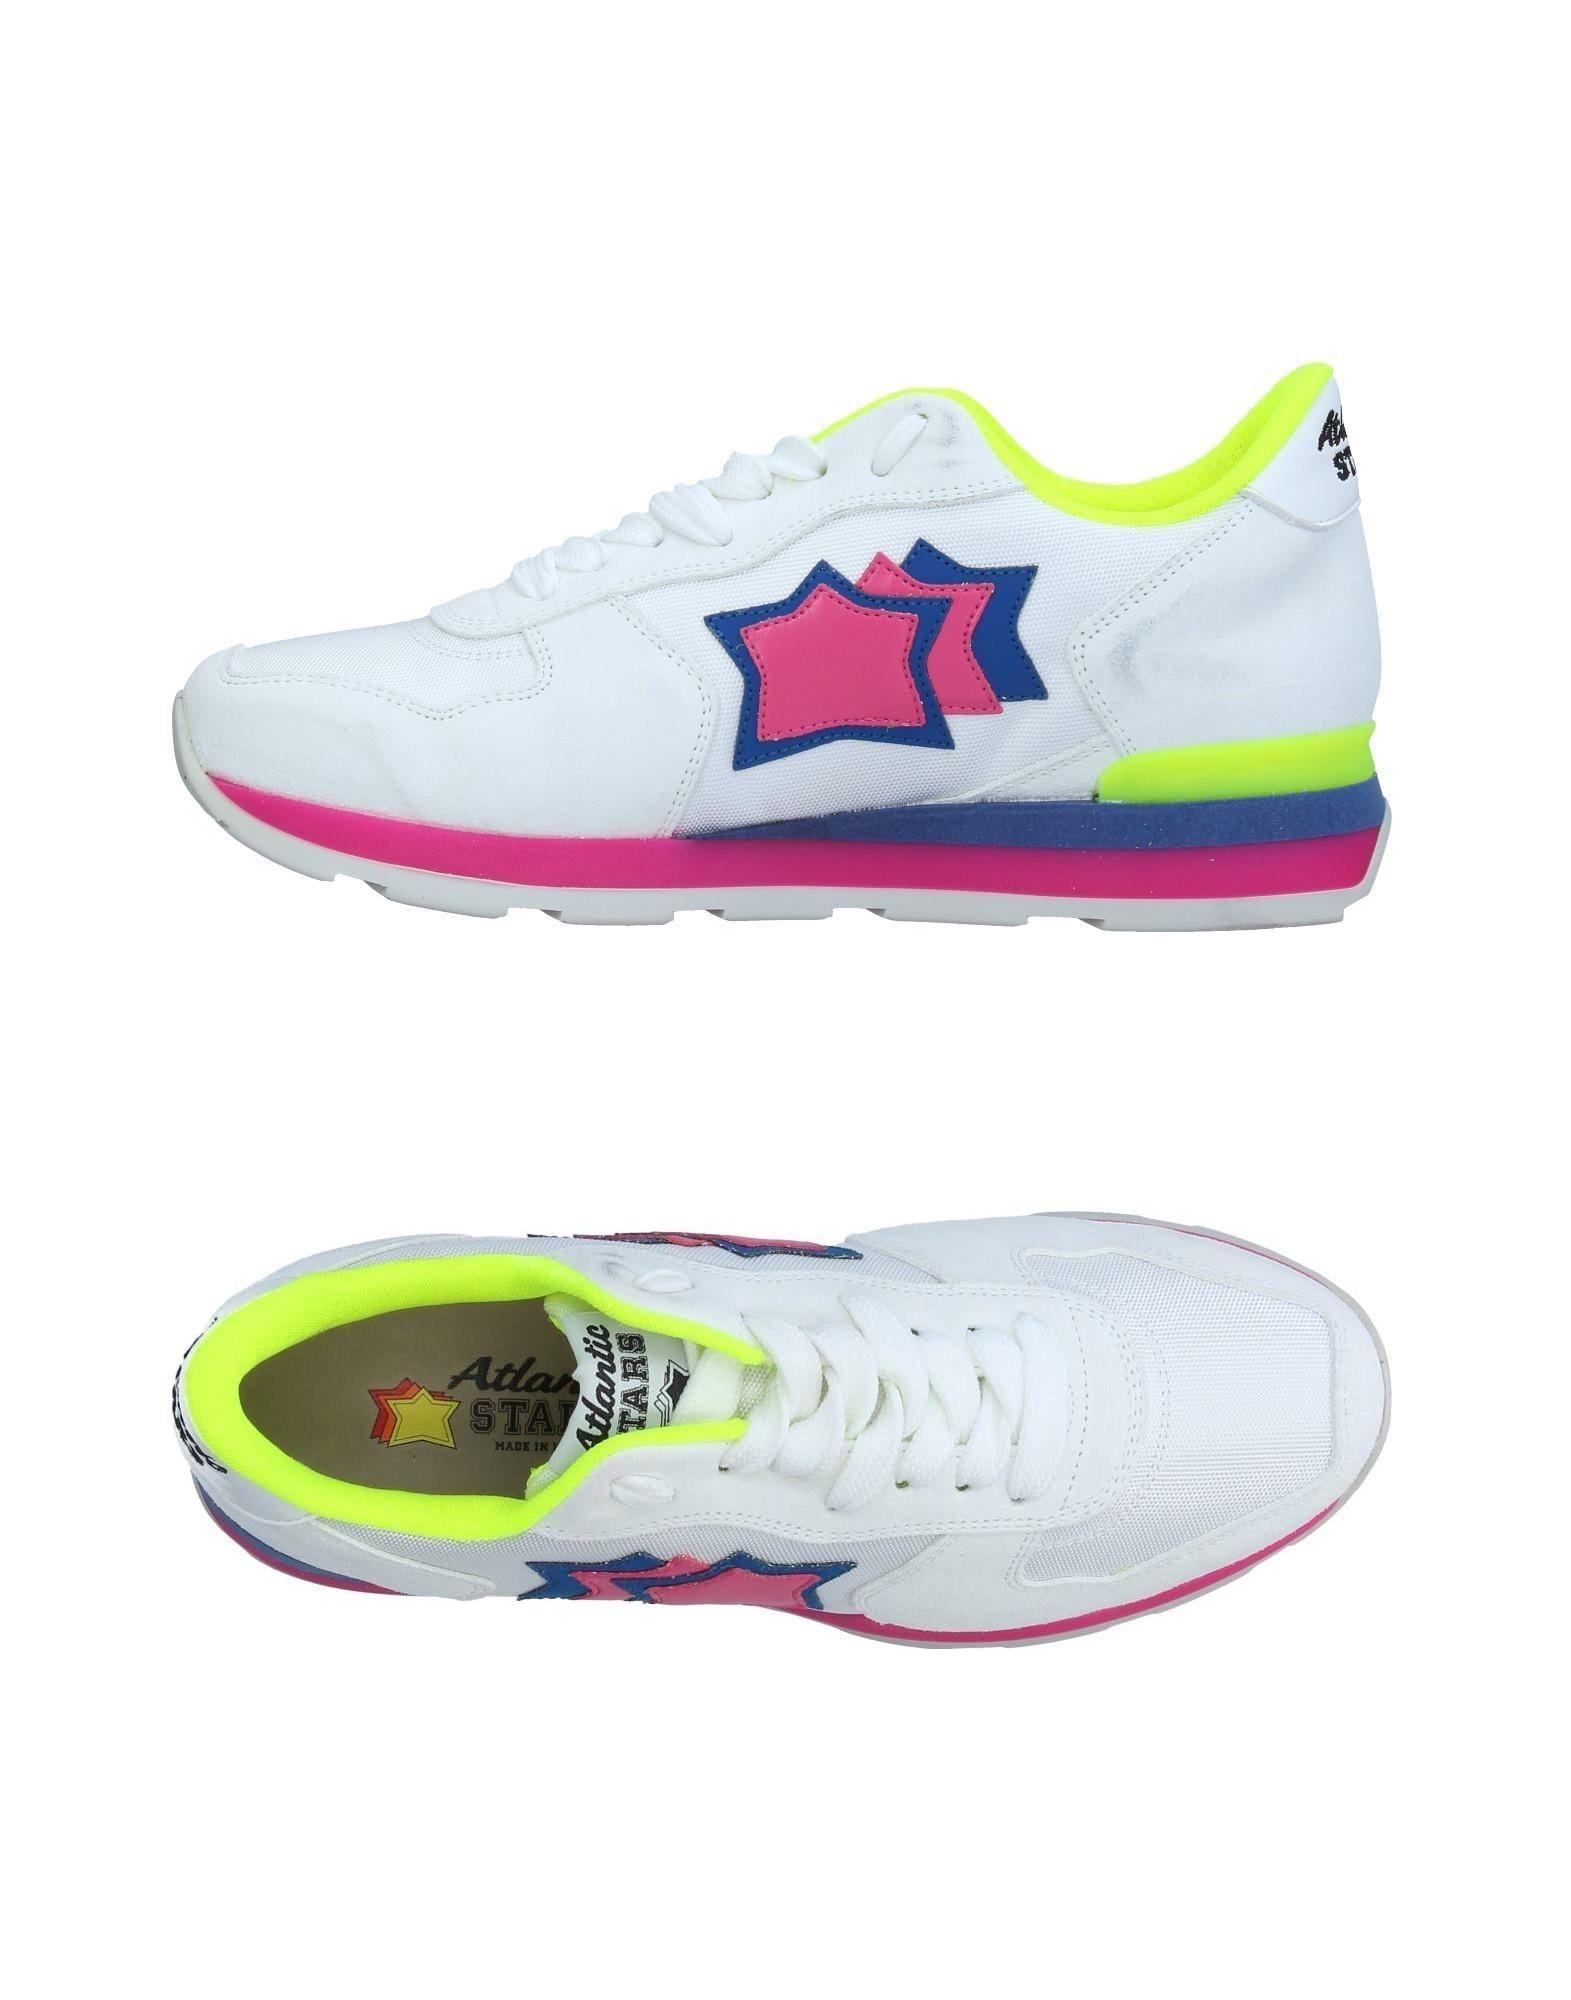 Gut um billige Schuhe Damen zu tragenAtlantic Stars Turnschuhes Damen Schuhe 11367321LR 3acf20